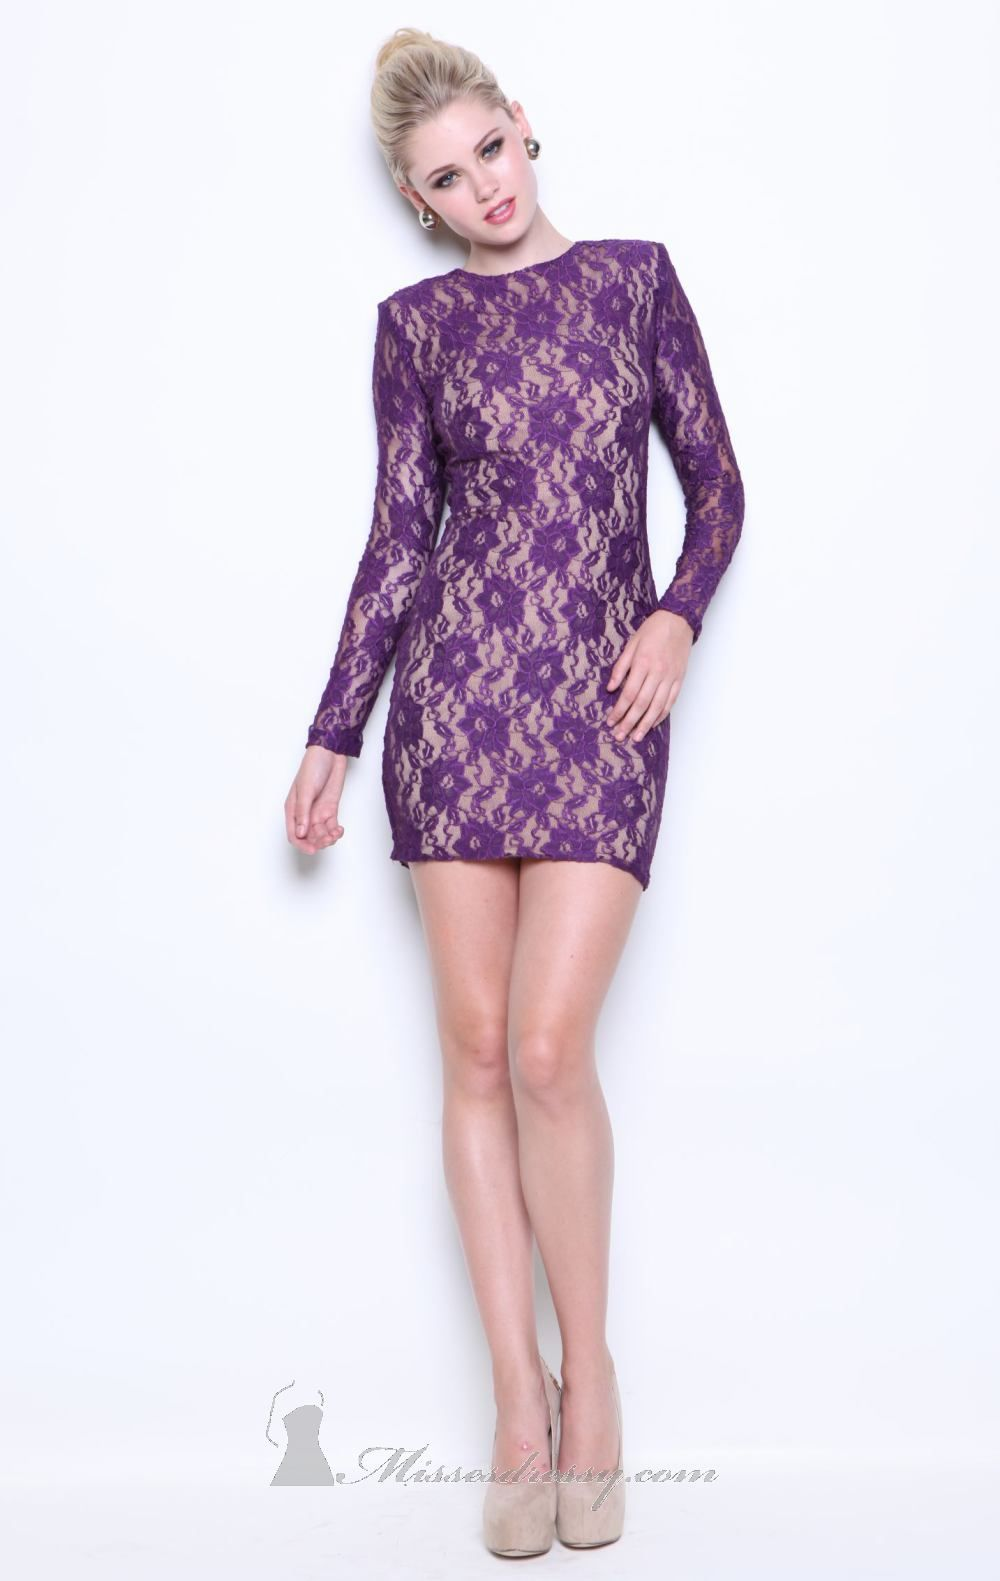 Atria 8060 Dress - MissesDressy.com  #lace #purple